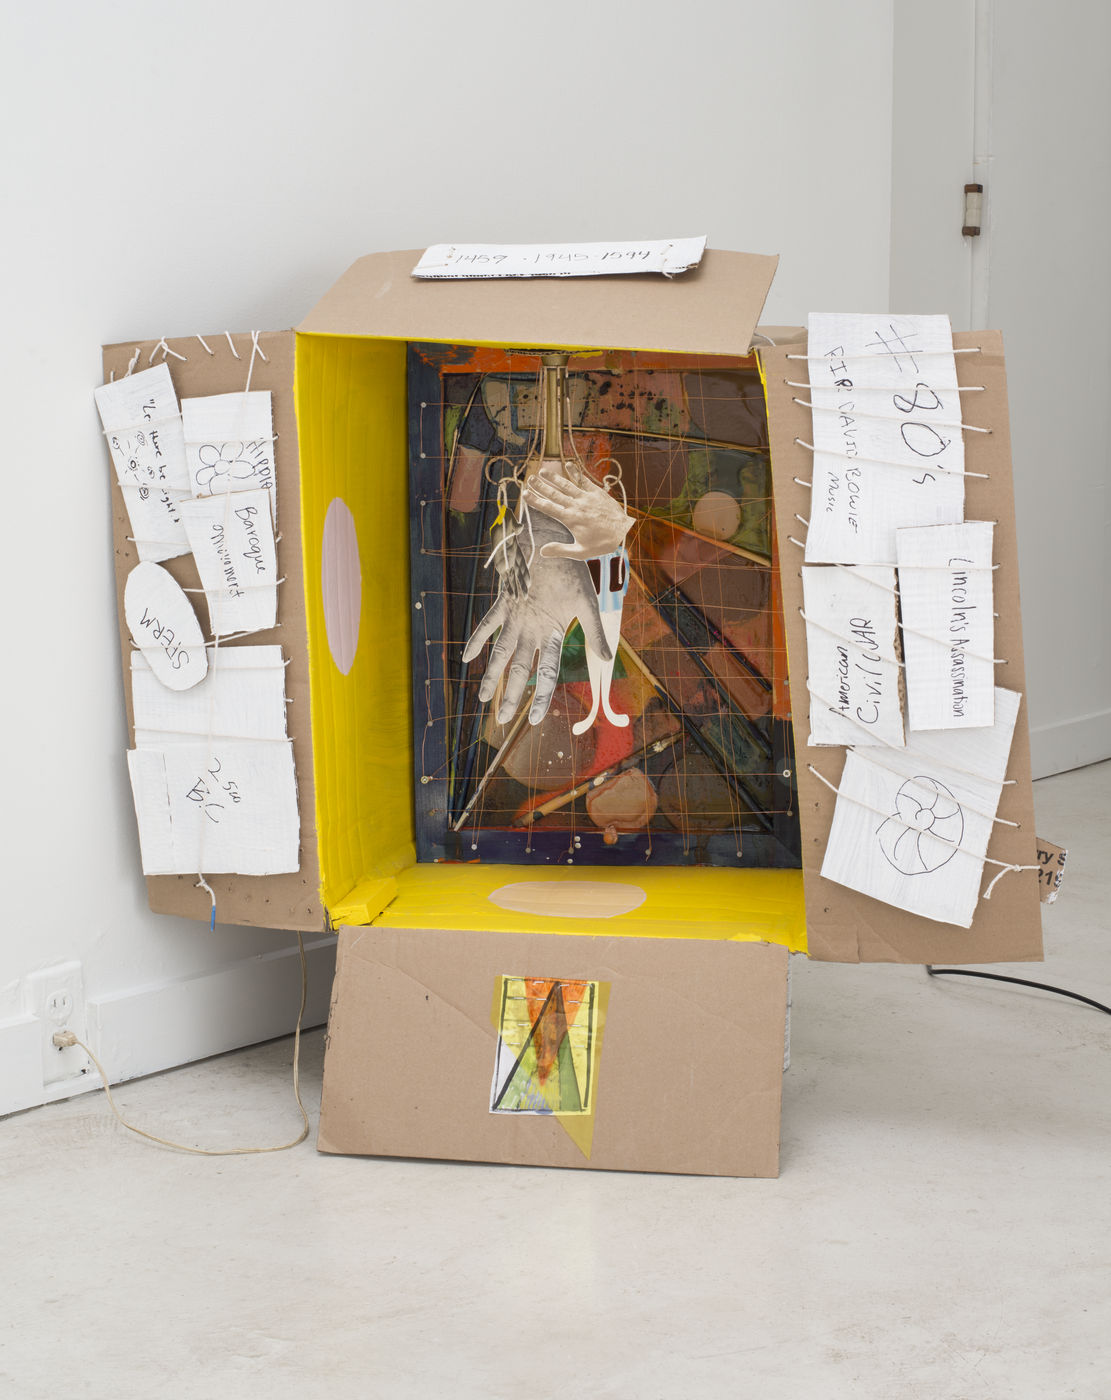 Molly Zuckerman Hartung, Small Town Mondrian, 2010 Oil On Canvas, 16 X 16 X  1 In (40.6 X 40.6 X 2.5 Cm)